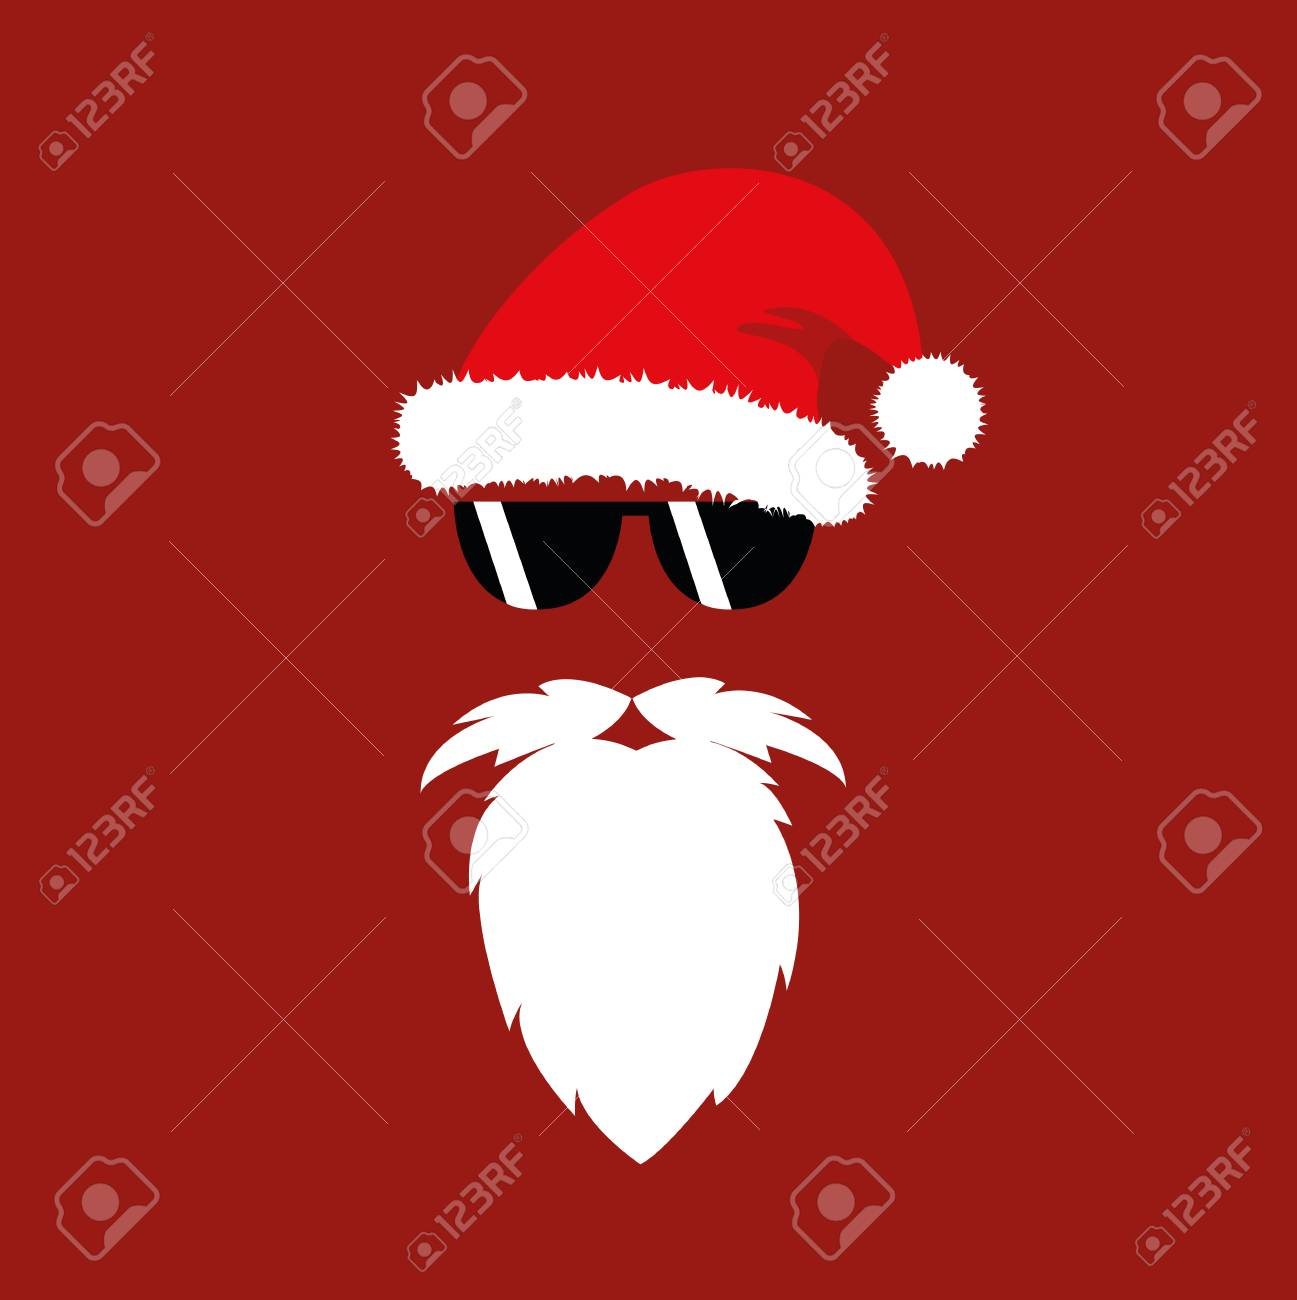 f8b6e901e63 hipster Santa Claus fashion mask with sunglasses vector illustartion EPS10  Stock Vector - 110232340